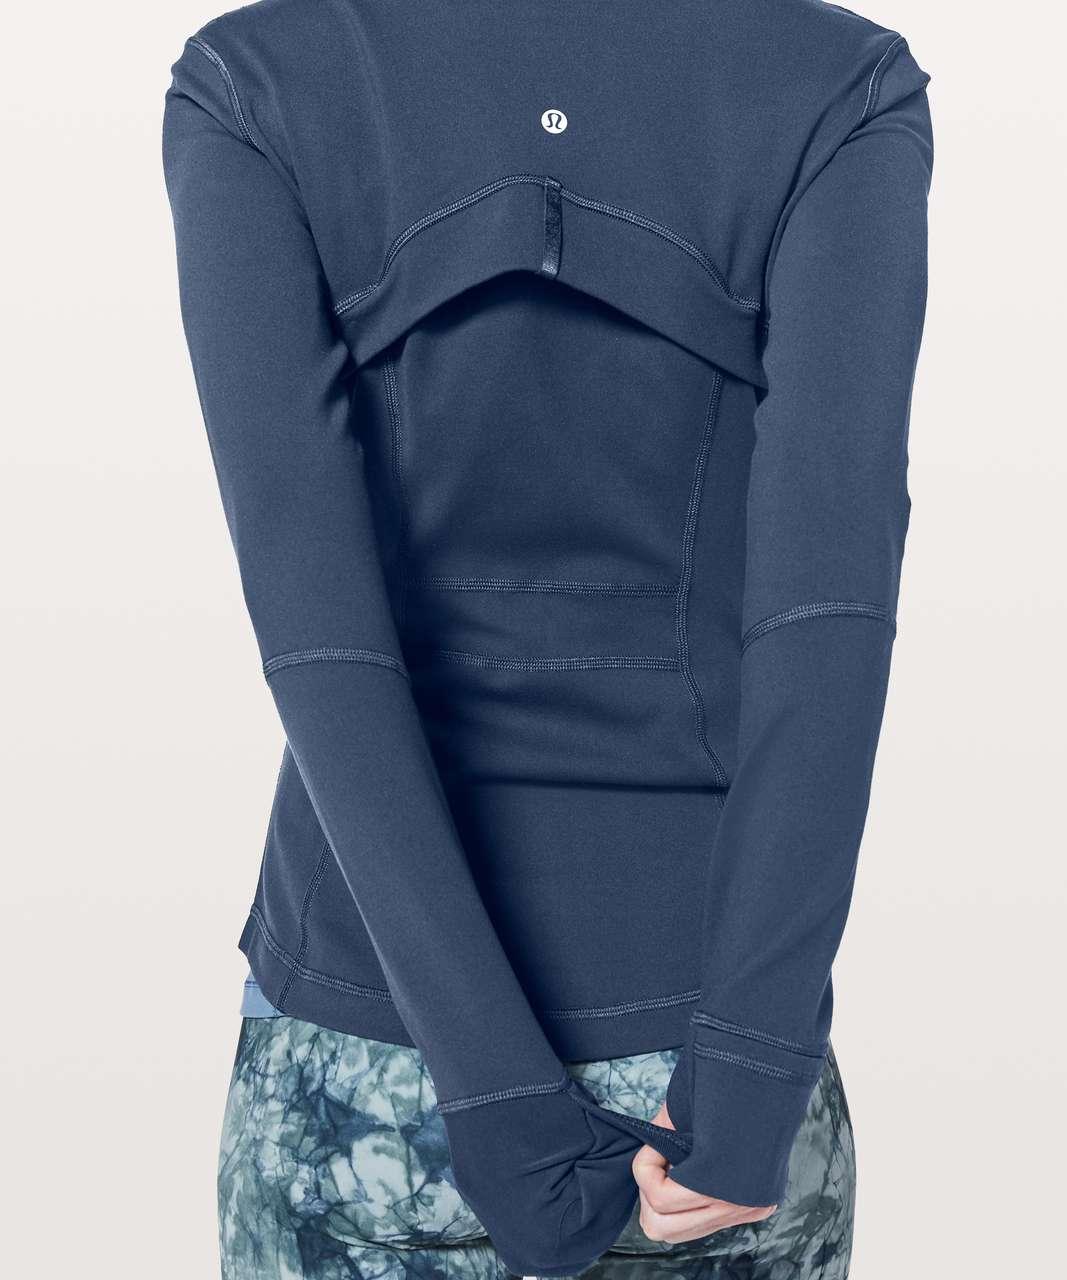 Lululemon Define Jacket - True Navy